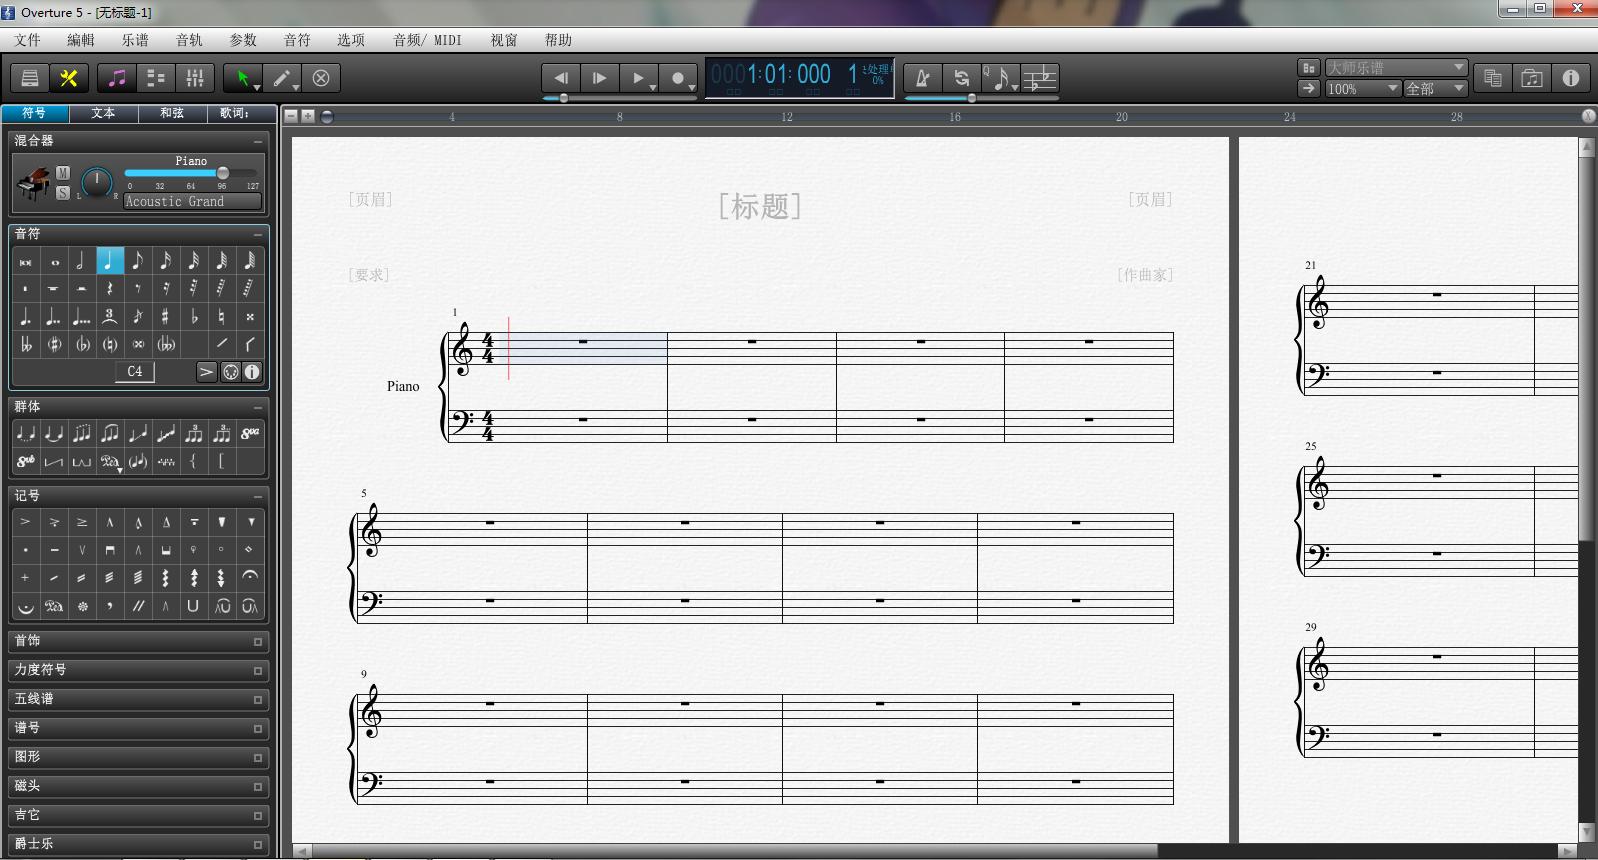 Overture常见问题之乐谱设置